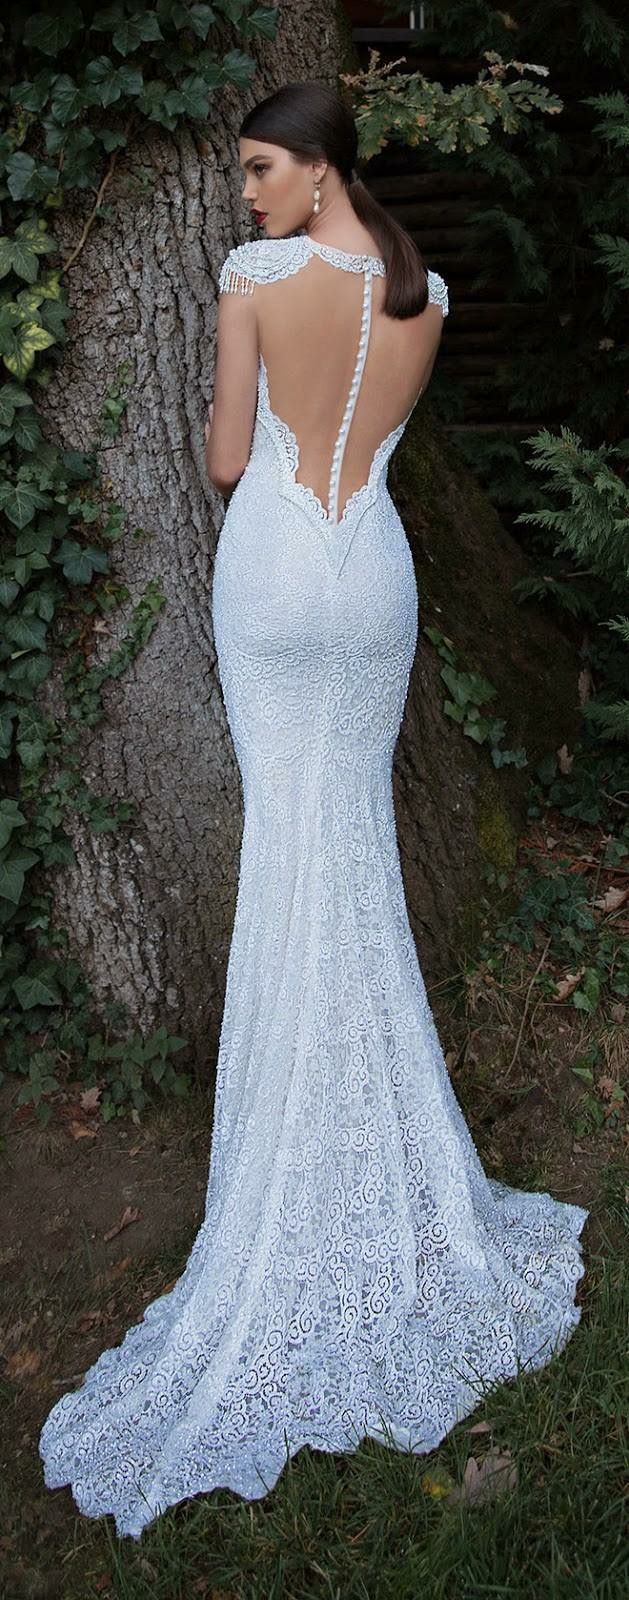 Wedding Dress Consignment, Steal The Wedding StealTheWedding.Com